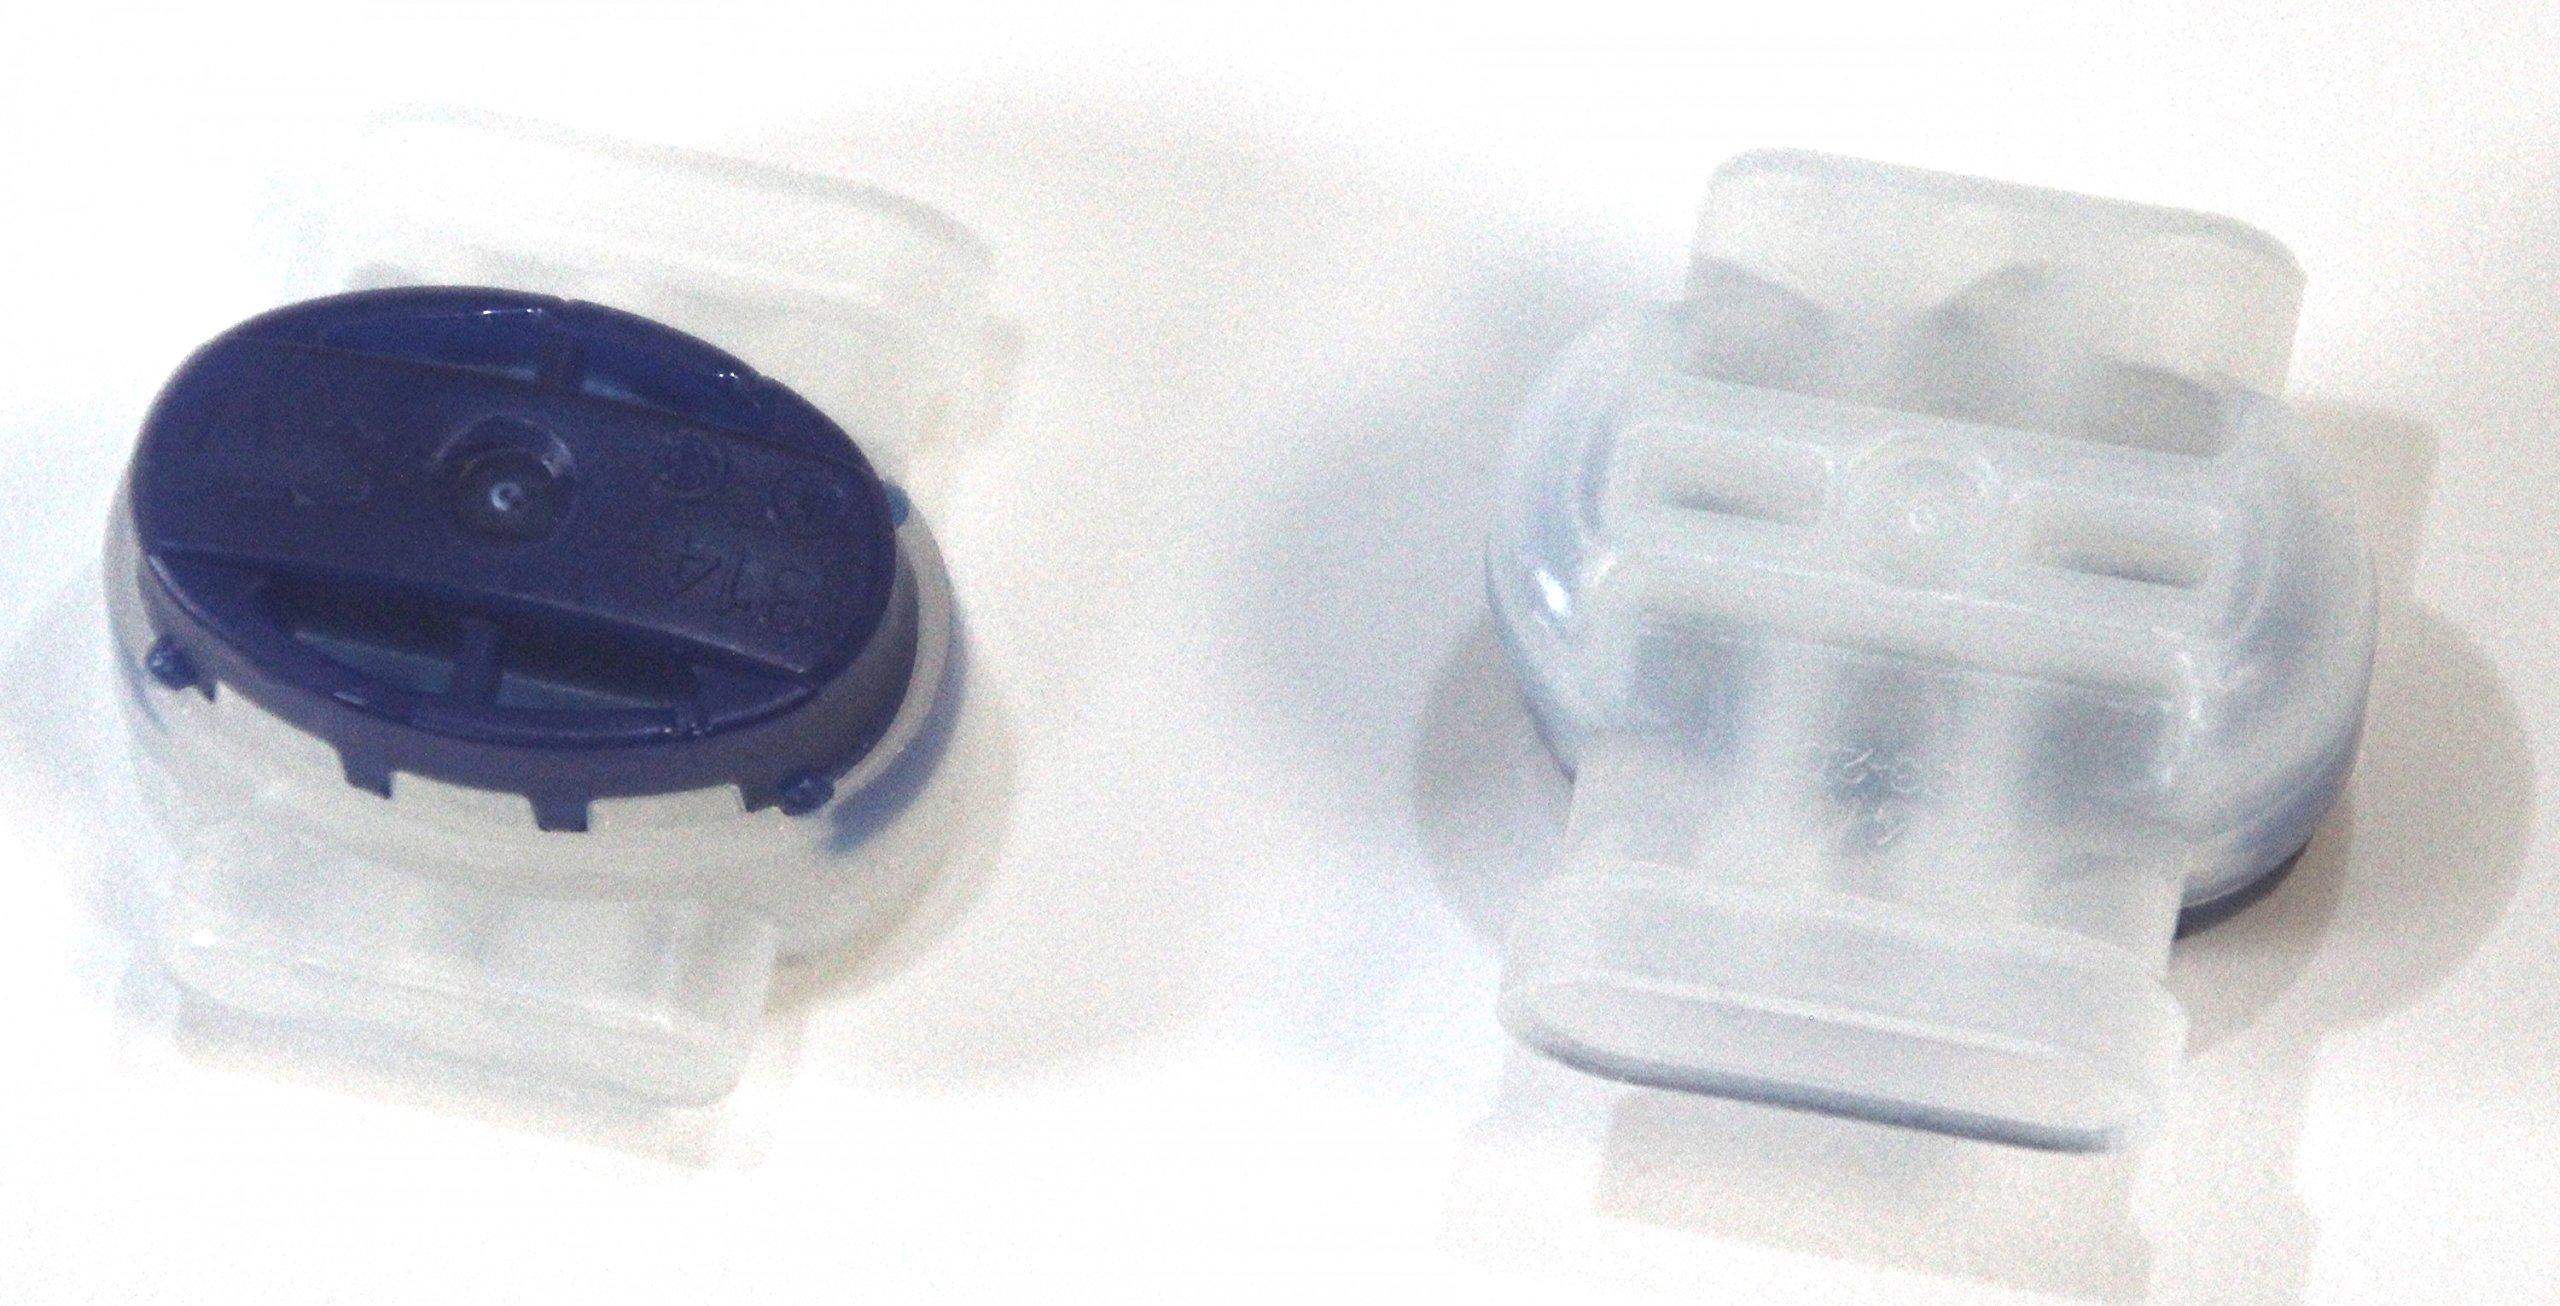 genisys-15x-Drahtverbinder-Kabel-Draht-Verbinder-3M-Scotchlok-314-Ambrogio-L300R-L400